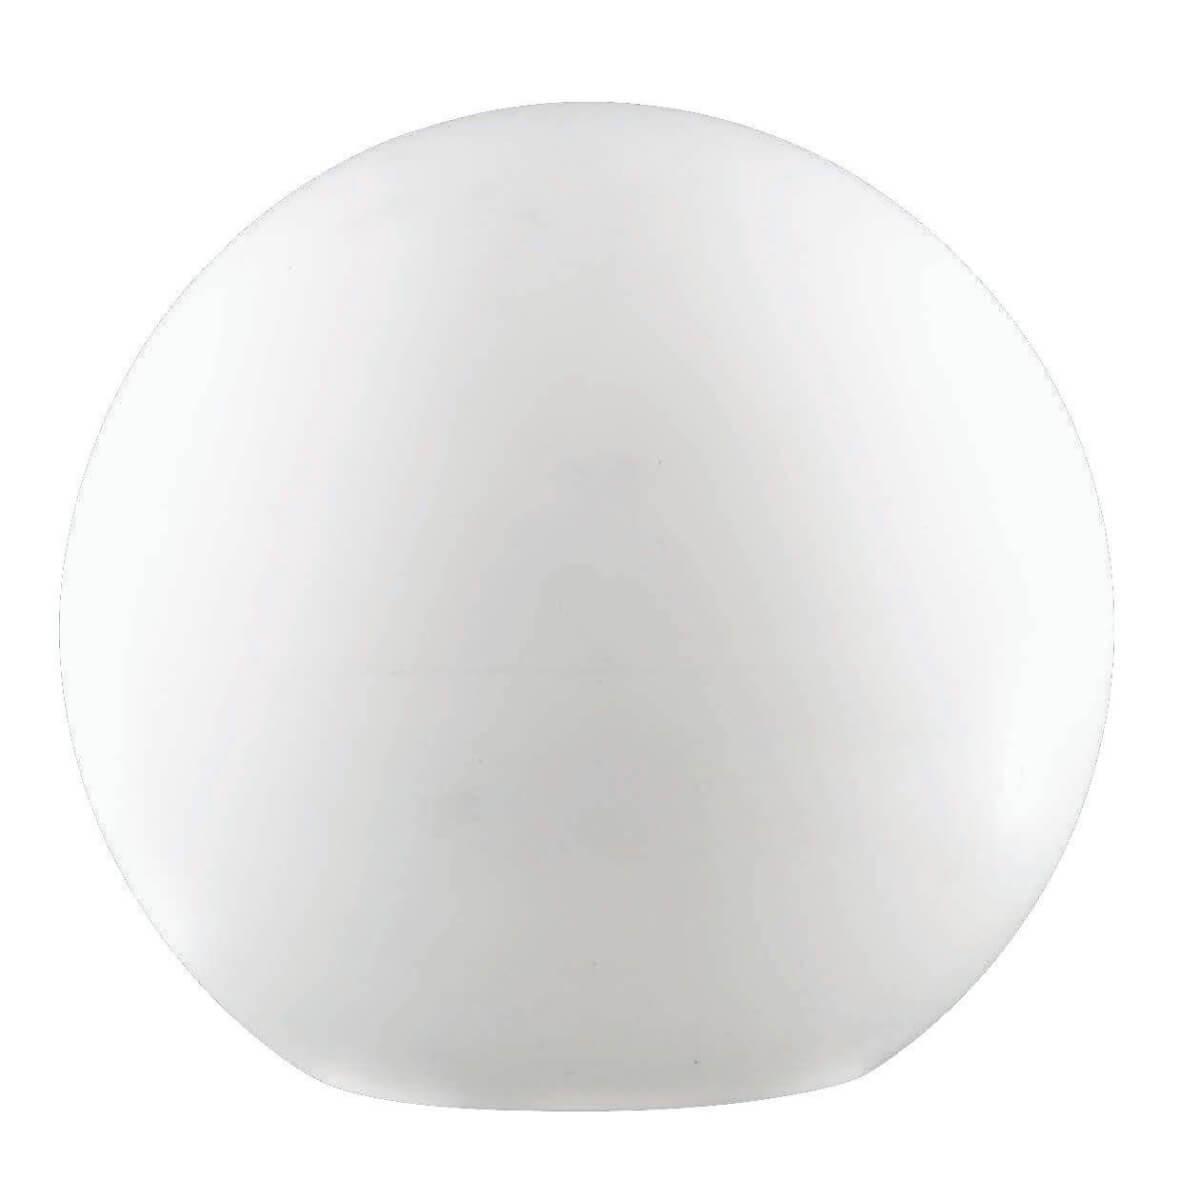 Уличный светильник Ideal Lux Sole Pt1 Small, E27